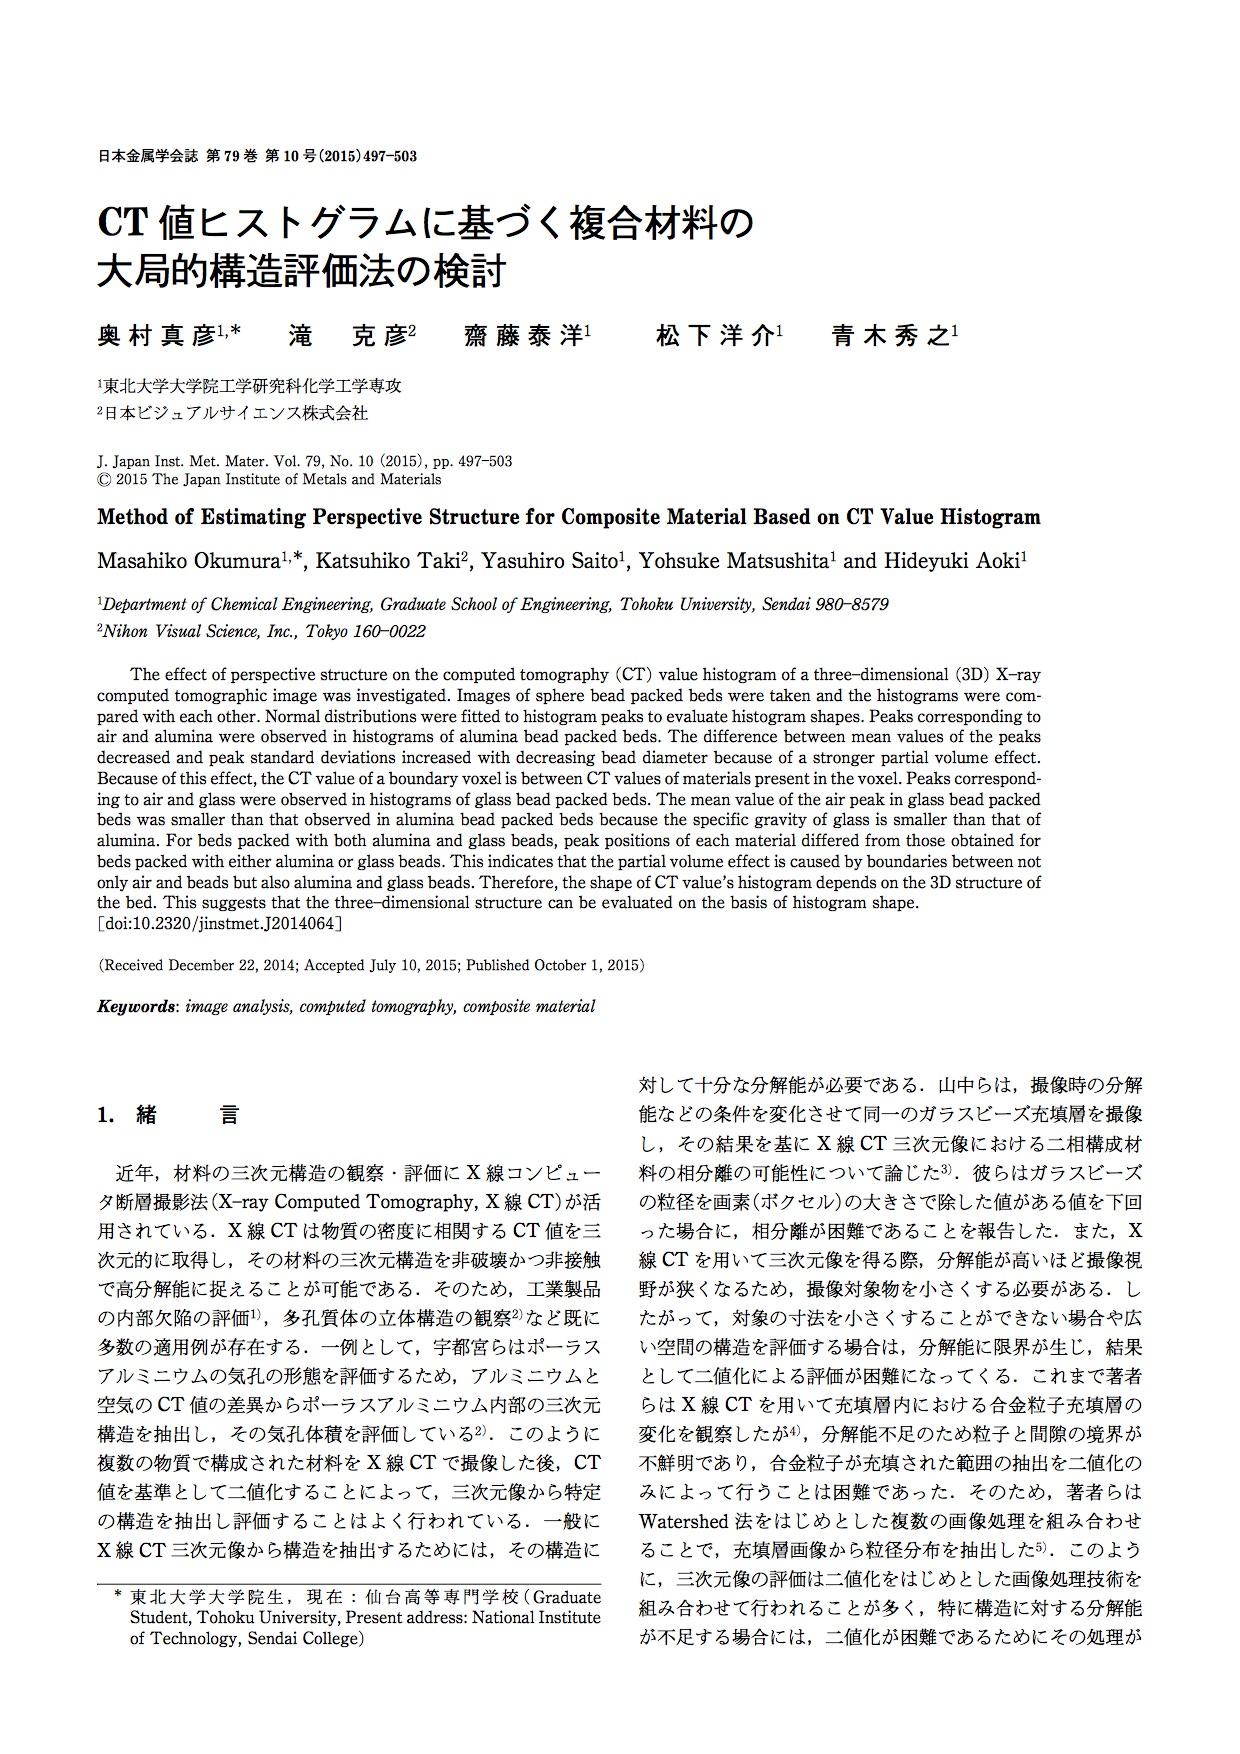 CT値ヒストグラムに基づく複合材料の大局的構造評価法の検討 奥村 真彦(東北大学)、滝 克彦(日本ビジュアルサイエンス)ほか 『日本金屬學會誌』、Vol.79、No.1、pp.497-503、(2015).